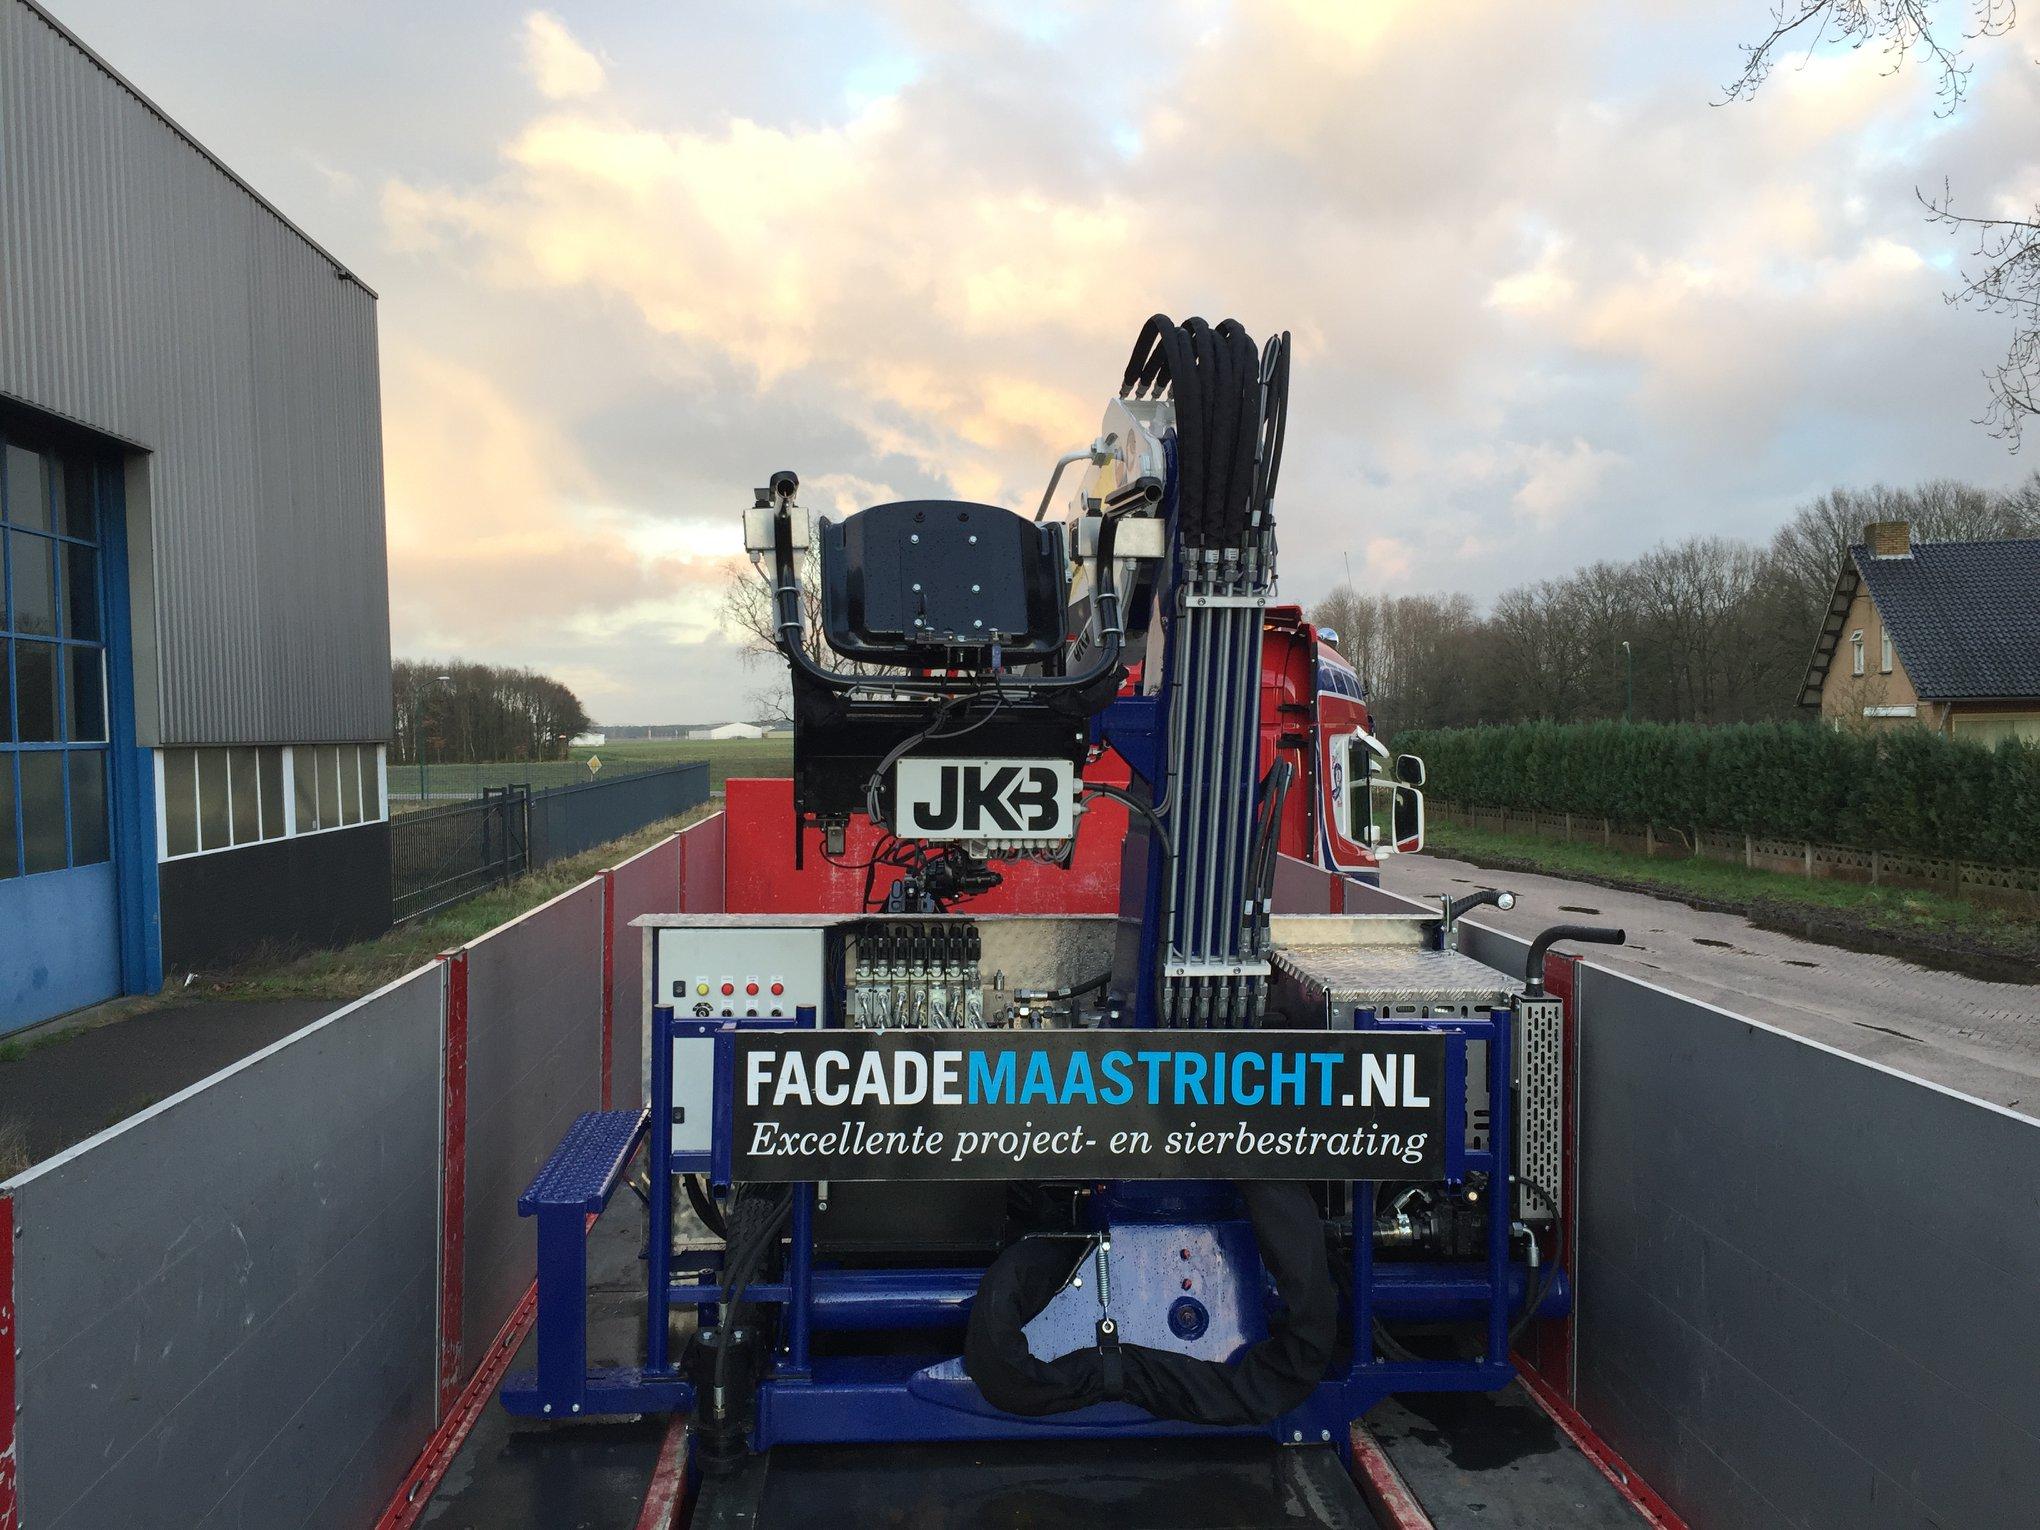 3-2-2018-nieuwe-JKB-in-gebruik-genomen-Chaffeur-Peter-Jeurninck-3